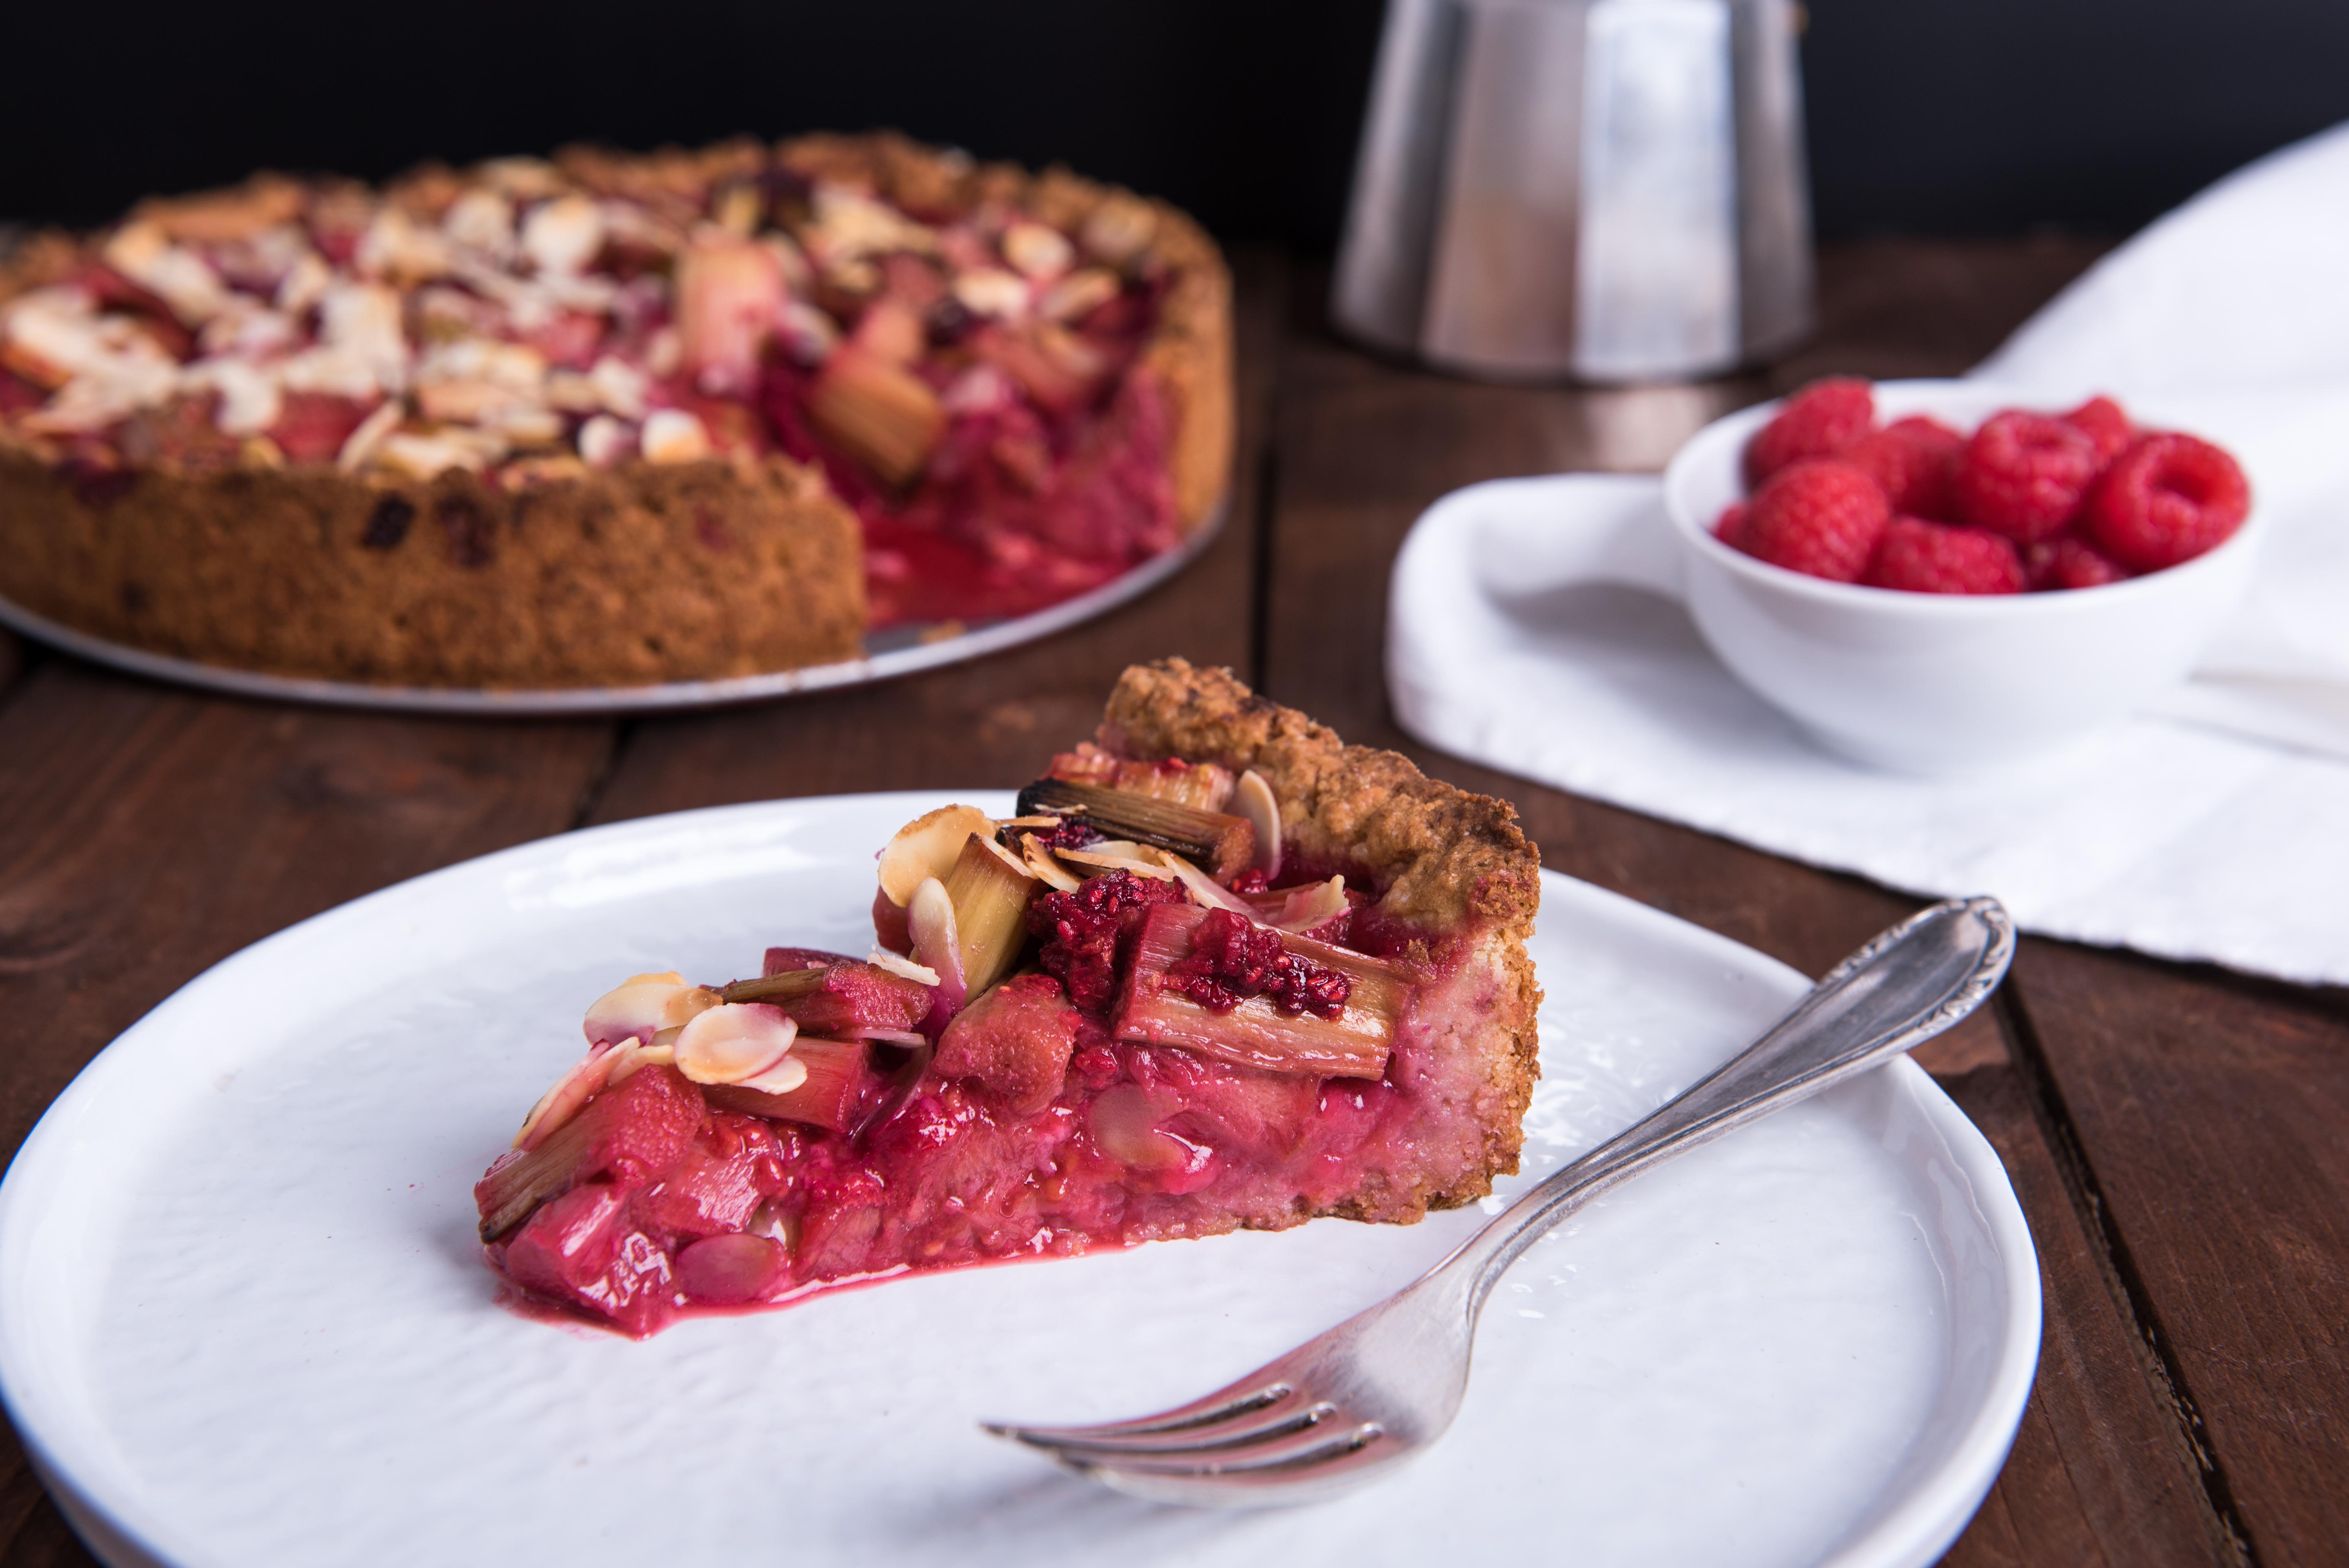 Rhabarber-Himbeer Kuchen